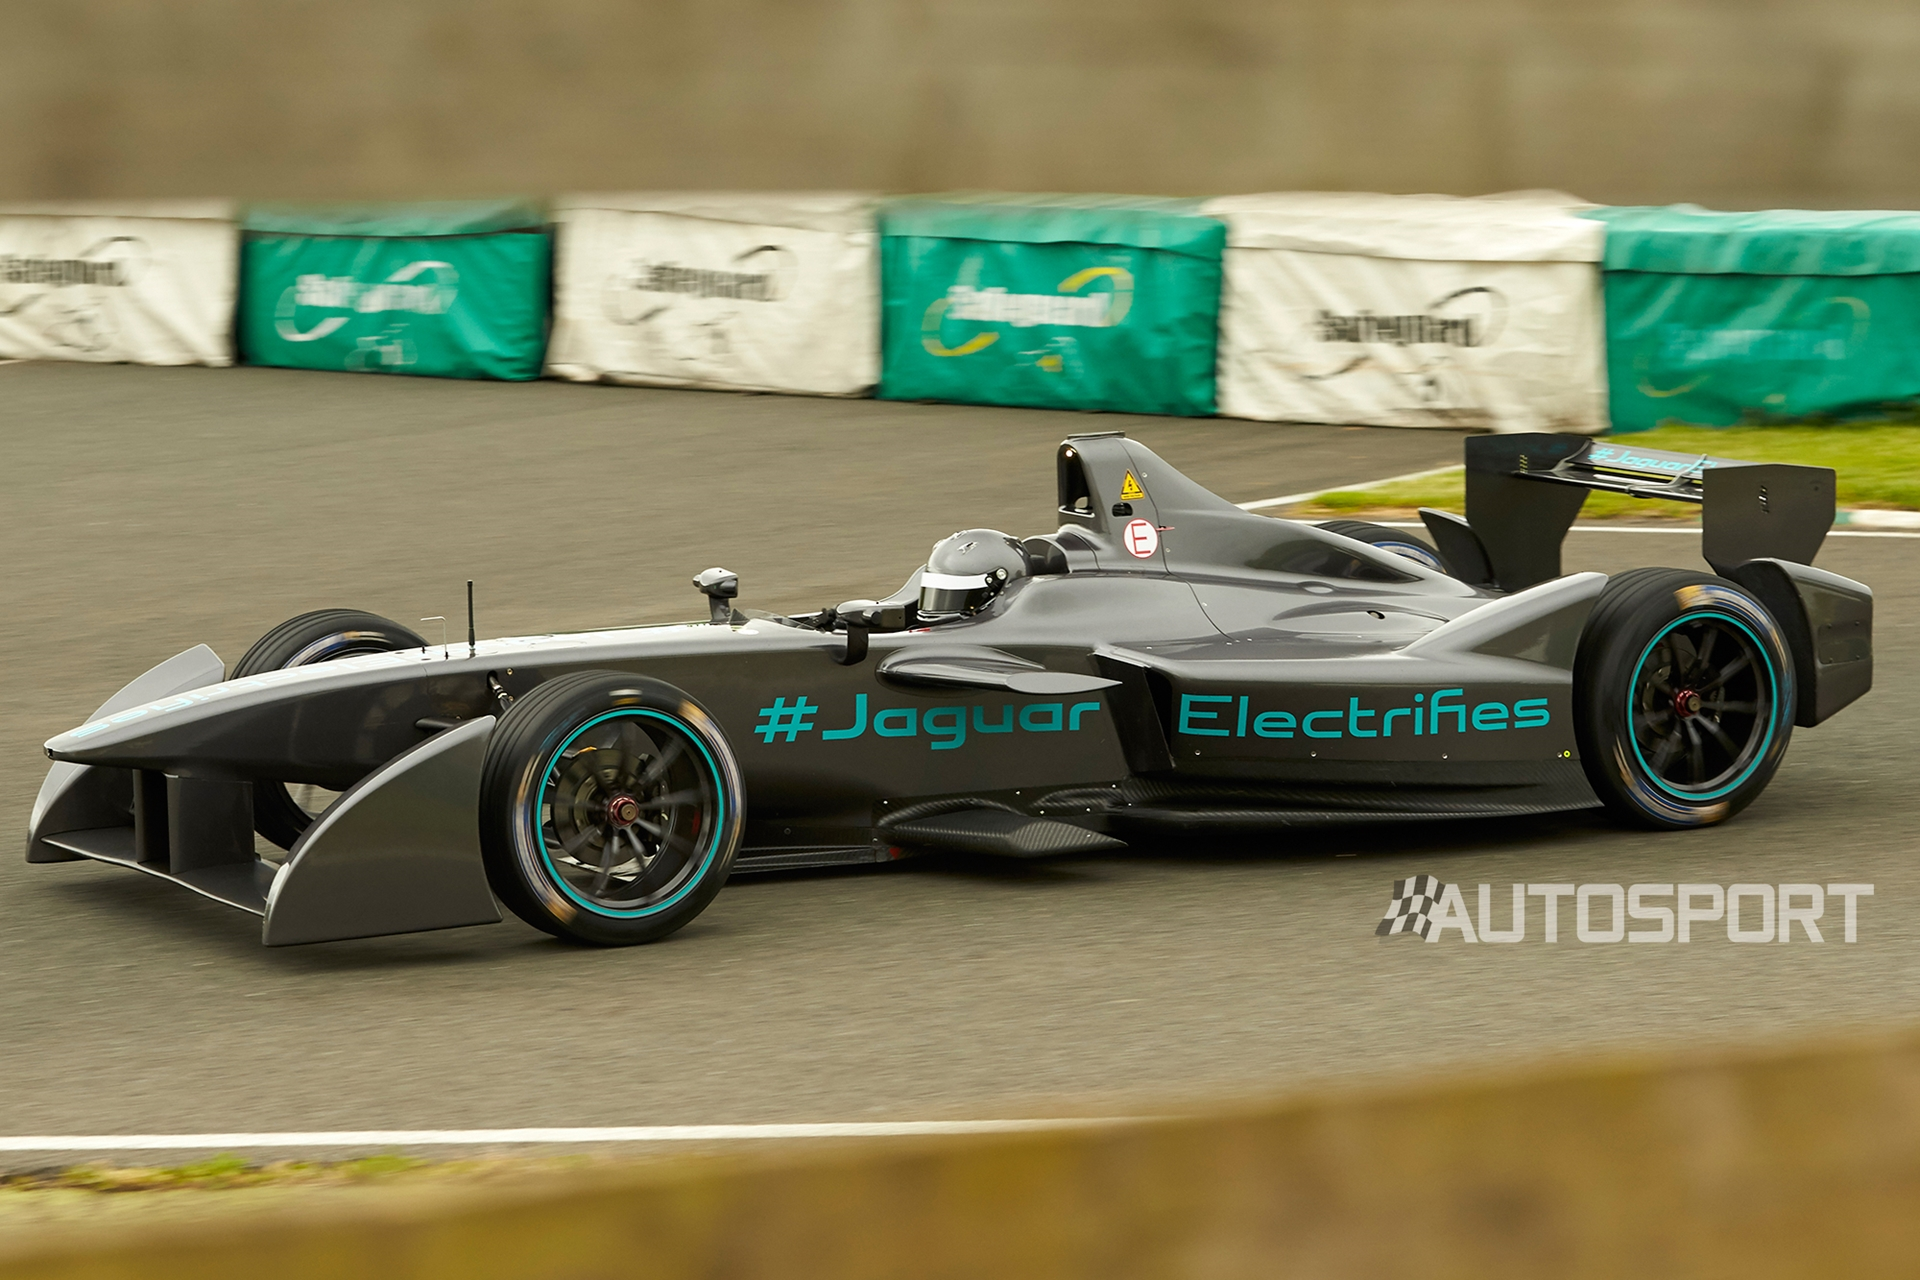 FIA Formula E - Jaguar